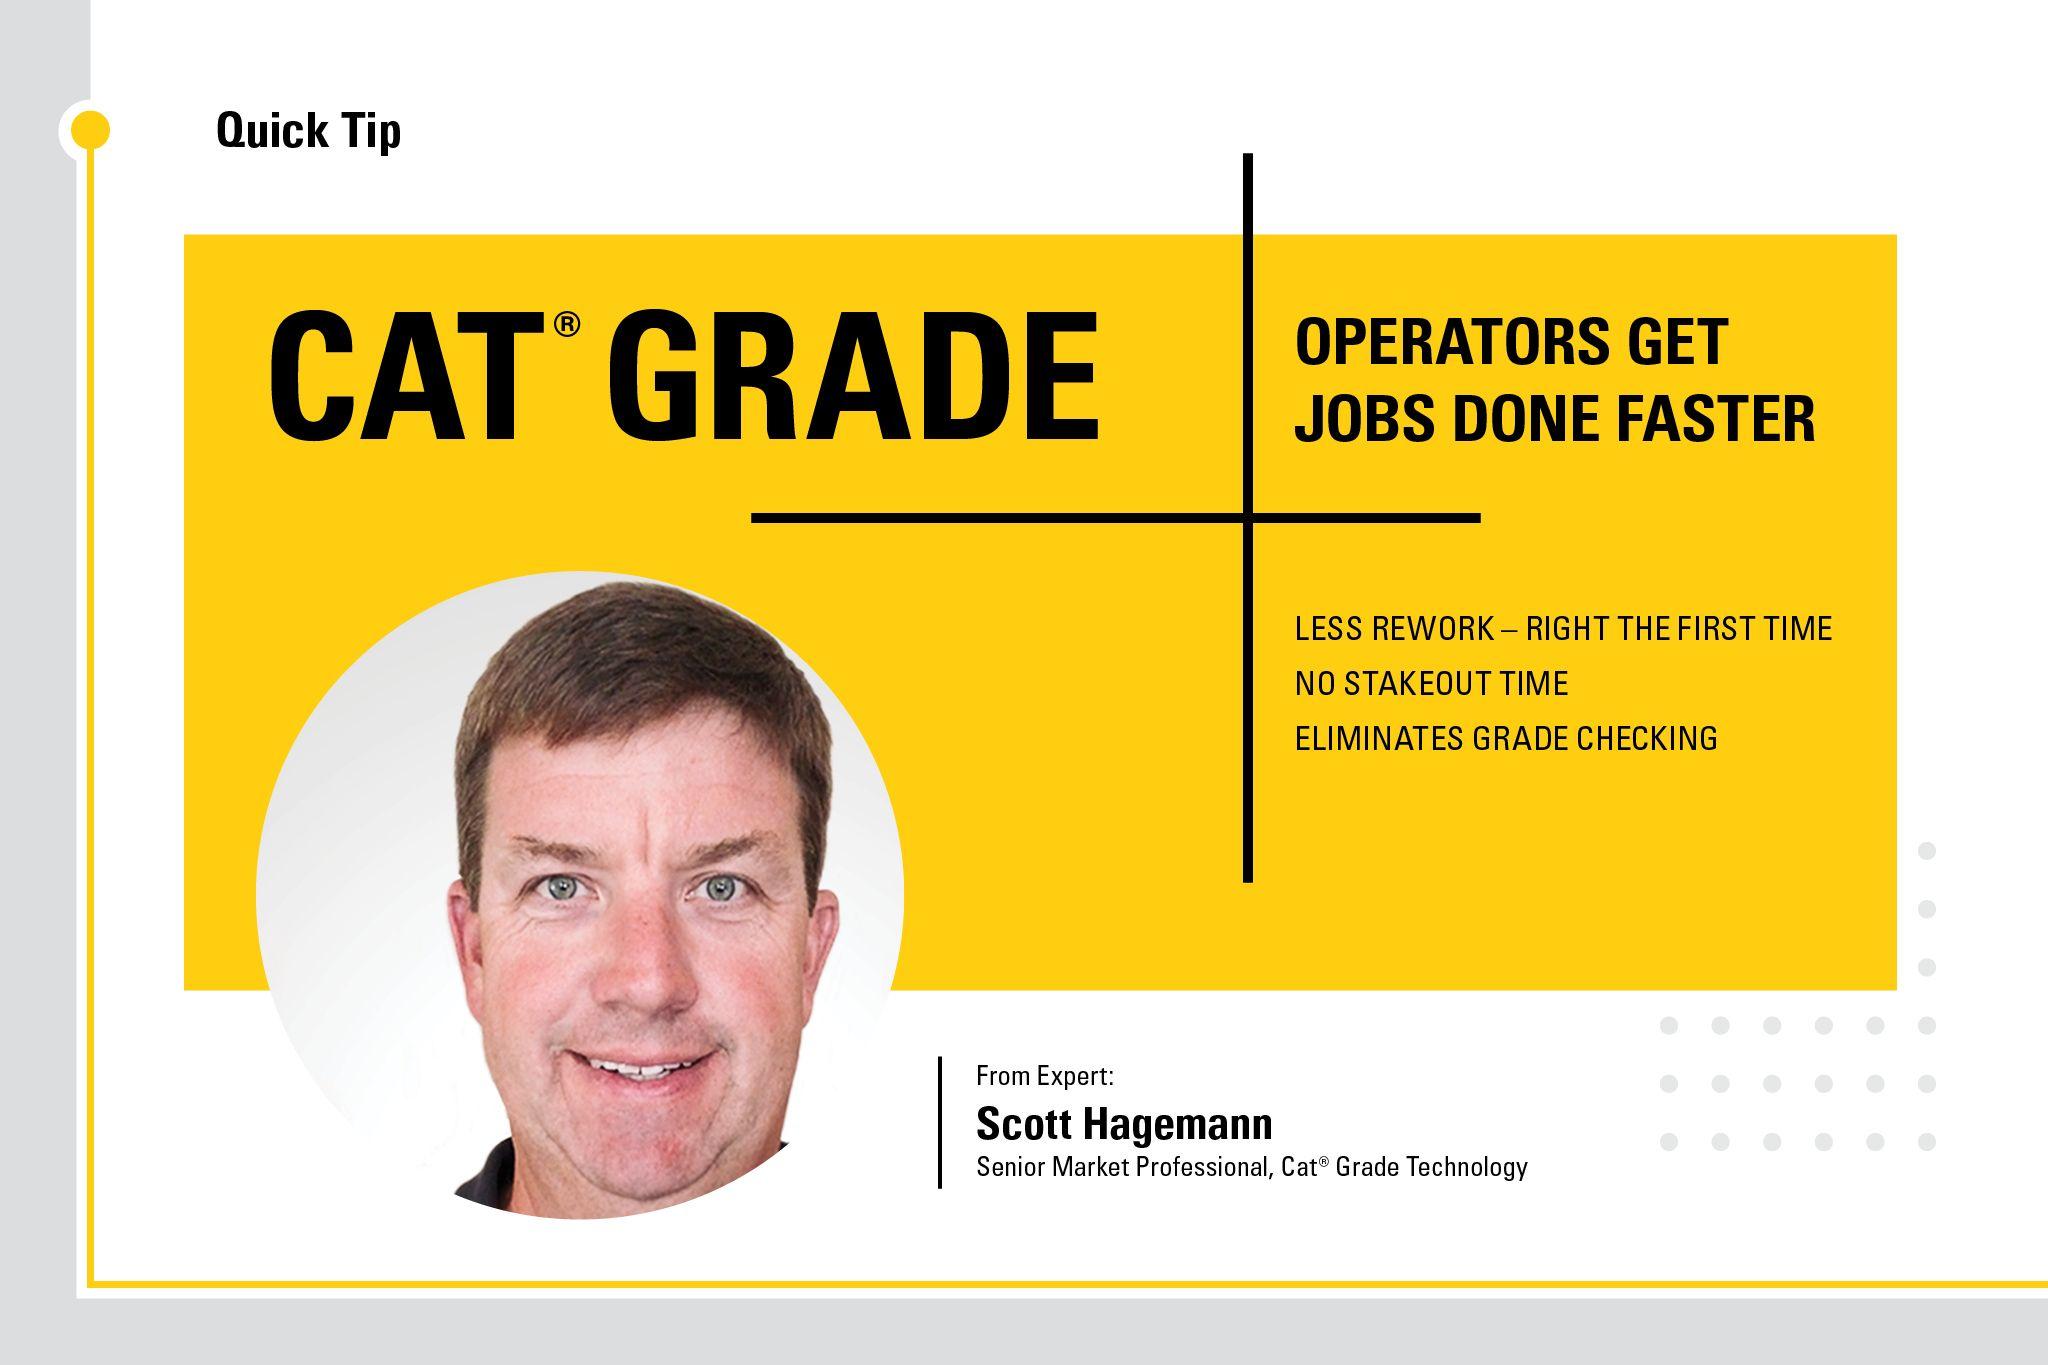 Cat Grade: Operators get jobs done faster.